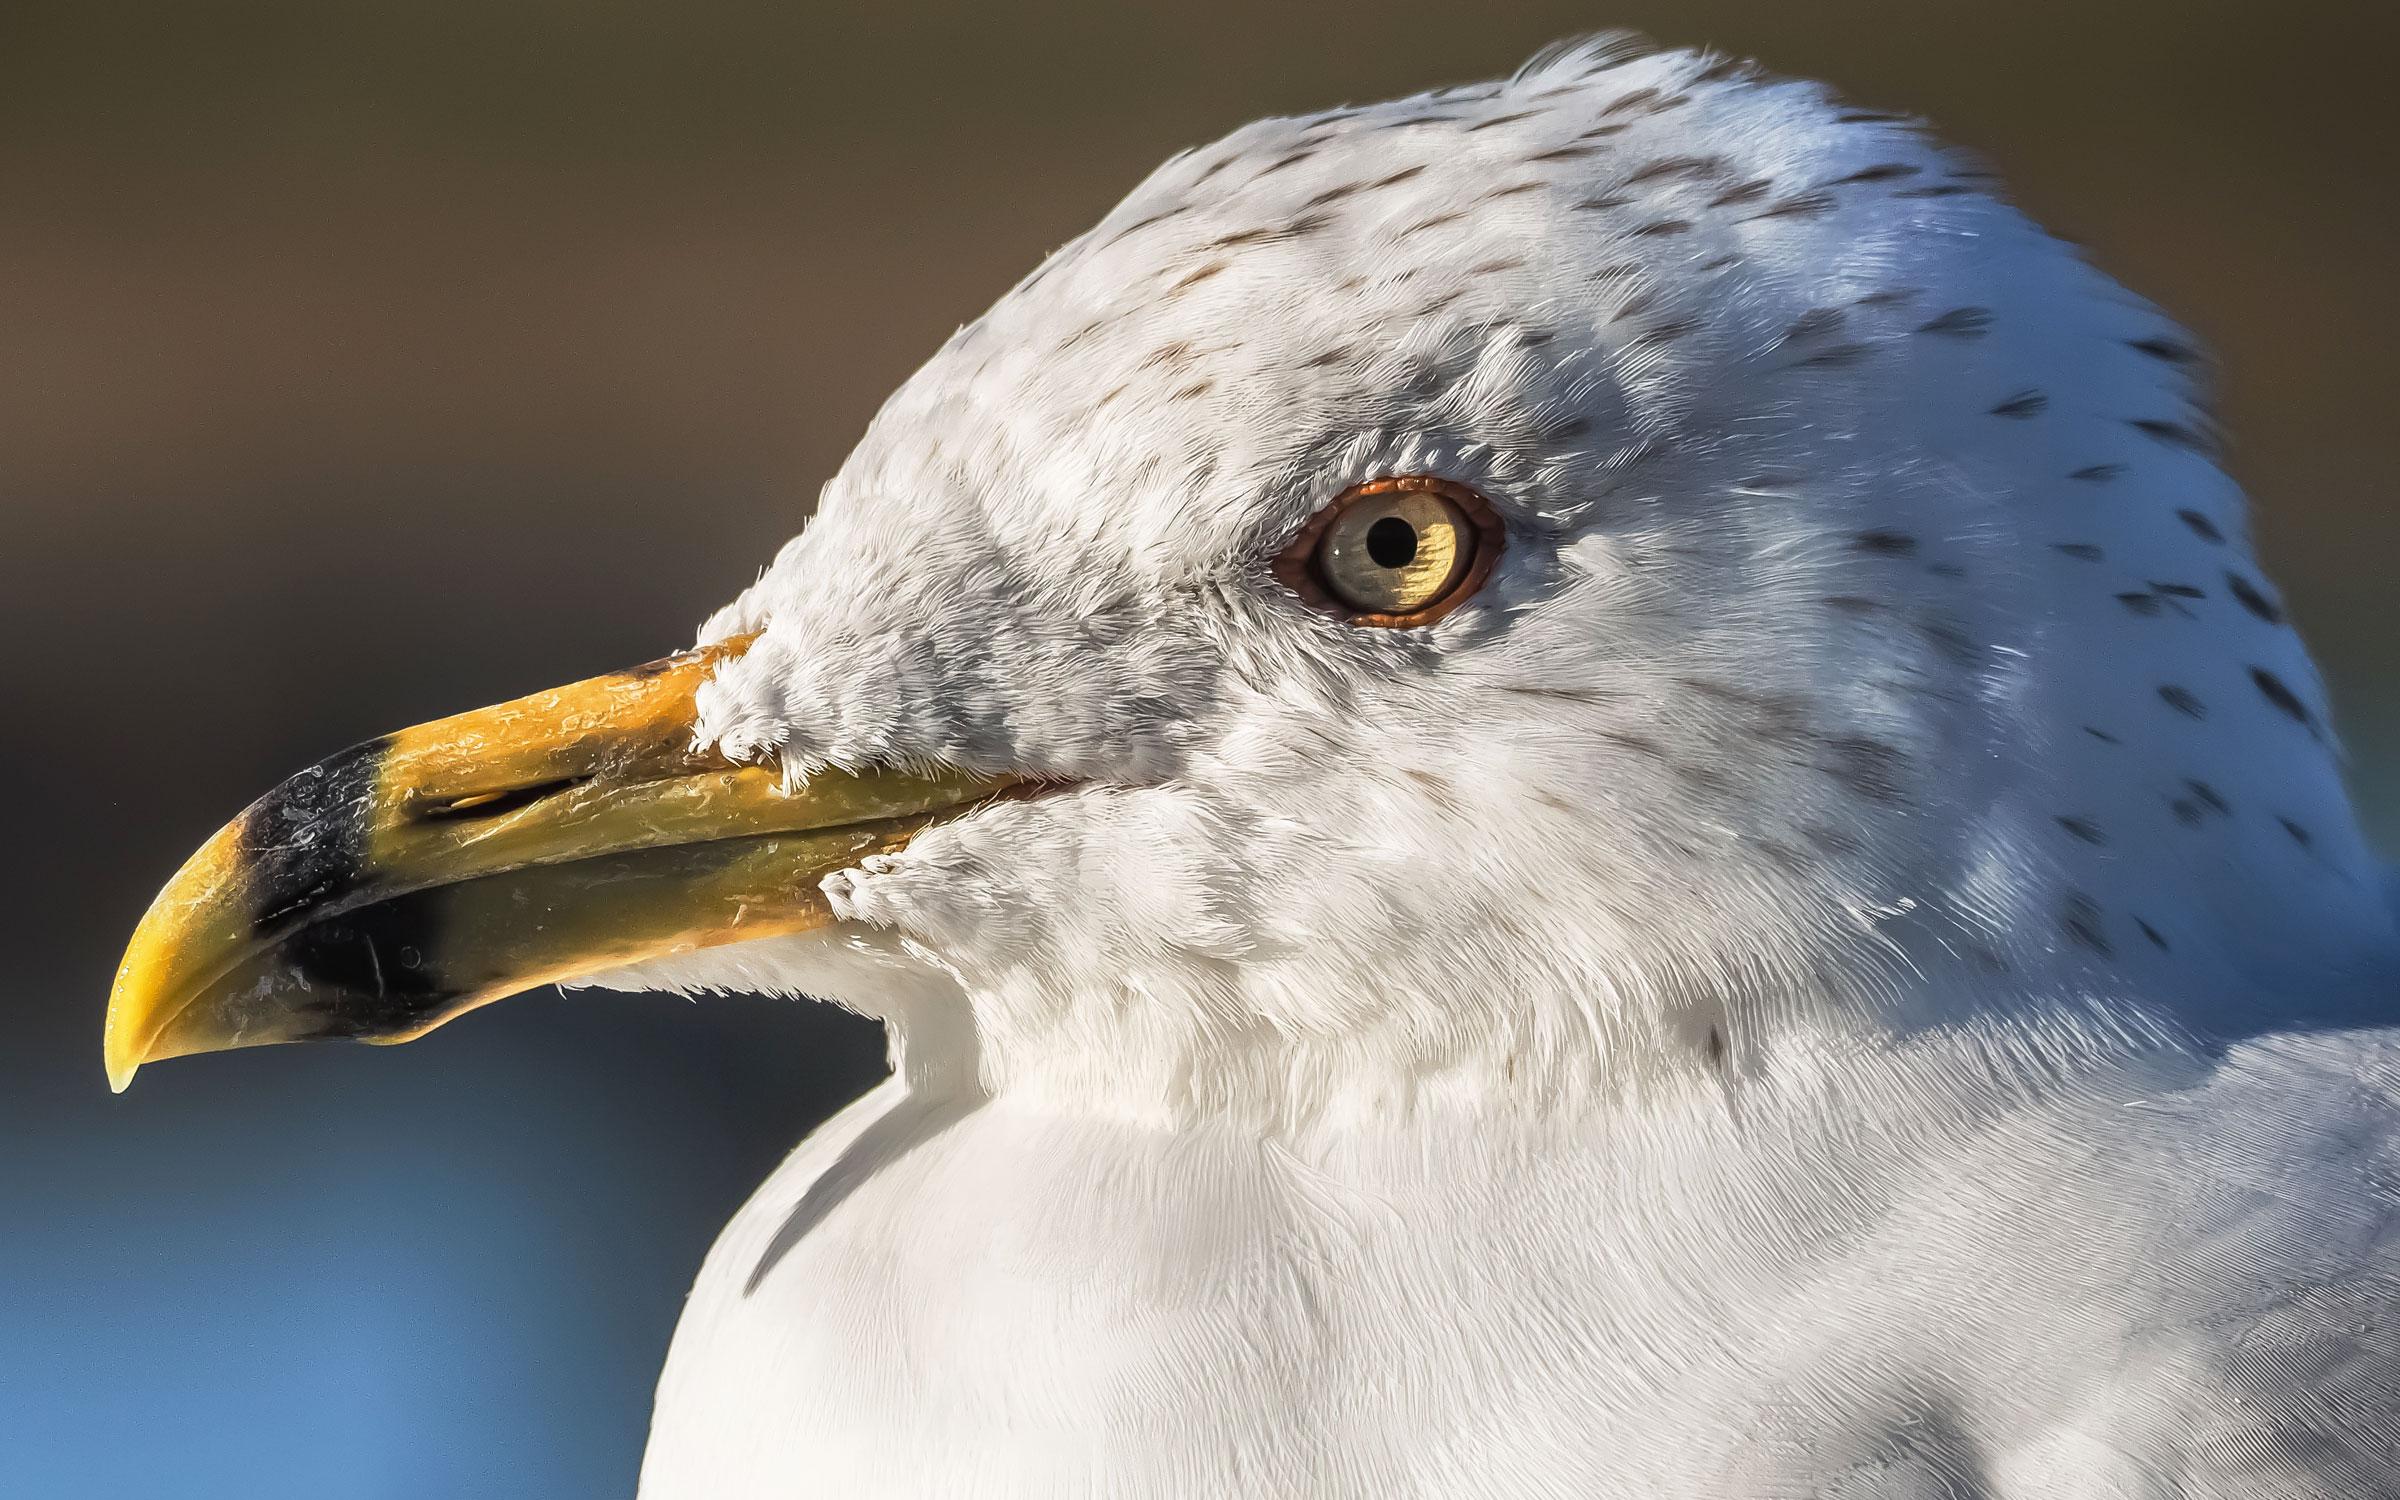 Ring-billed Gull. Tony Peebles/Great Backyard Bird Count